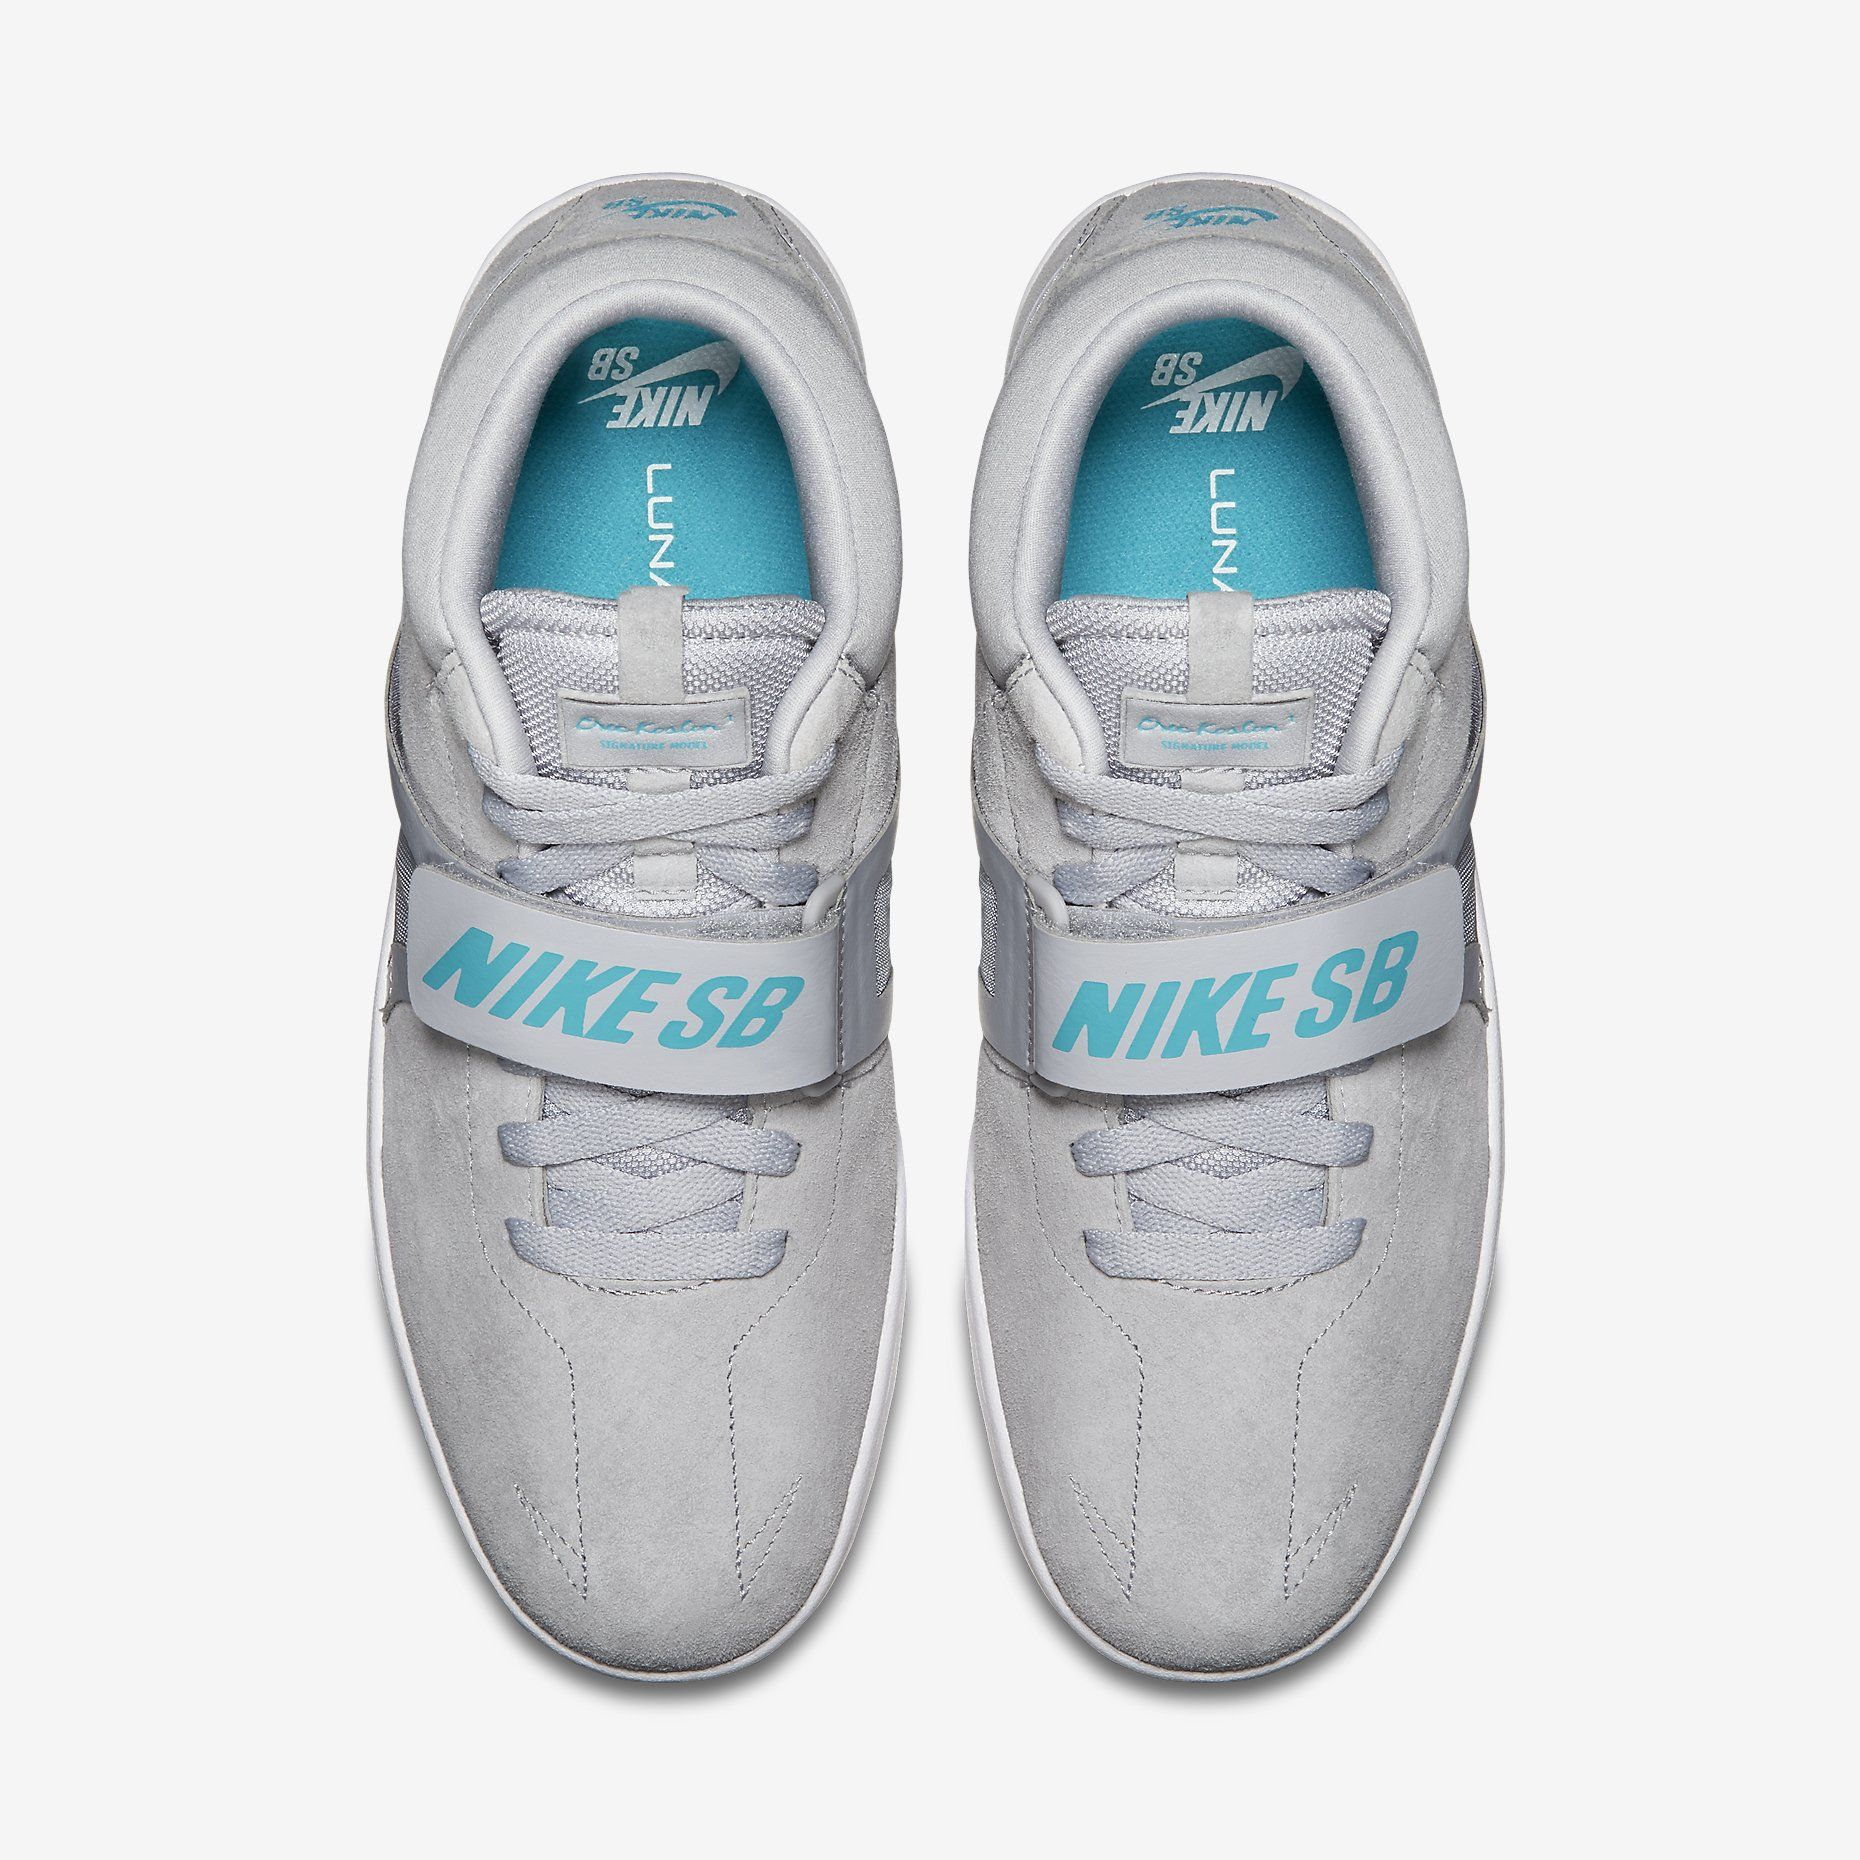 Experto estudio Aumentar  Nike SB Eric Koston Mid Premium Men's Skateboarding Shoe. Nike Store UK    Nike store, Sneakers, Nike sb